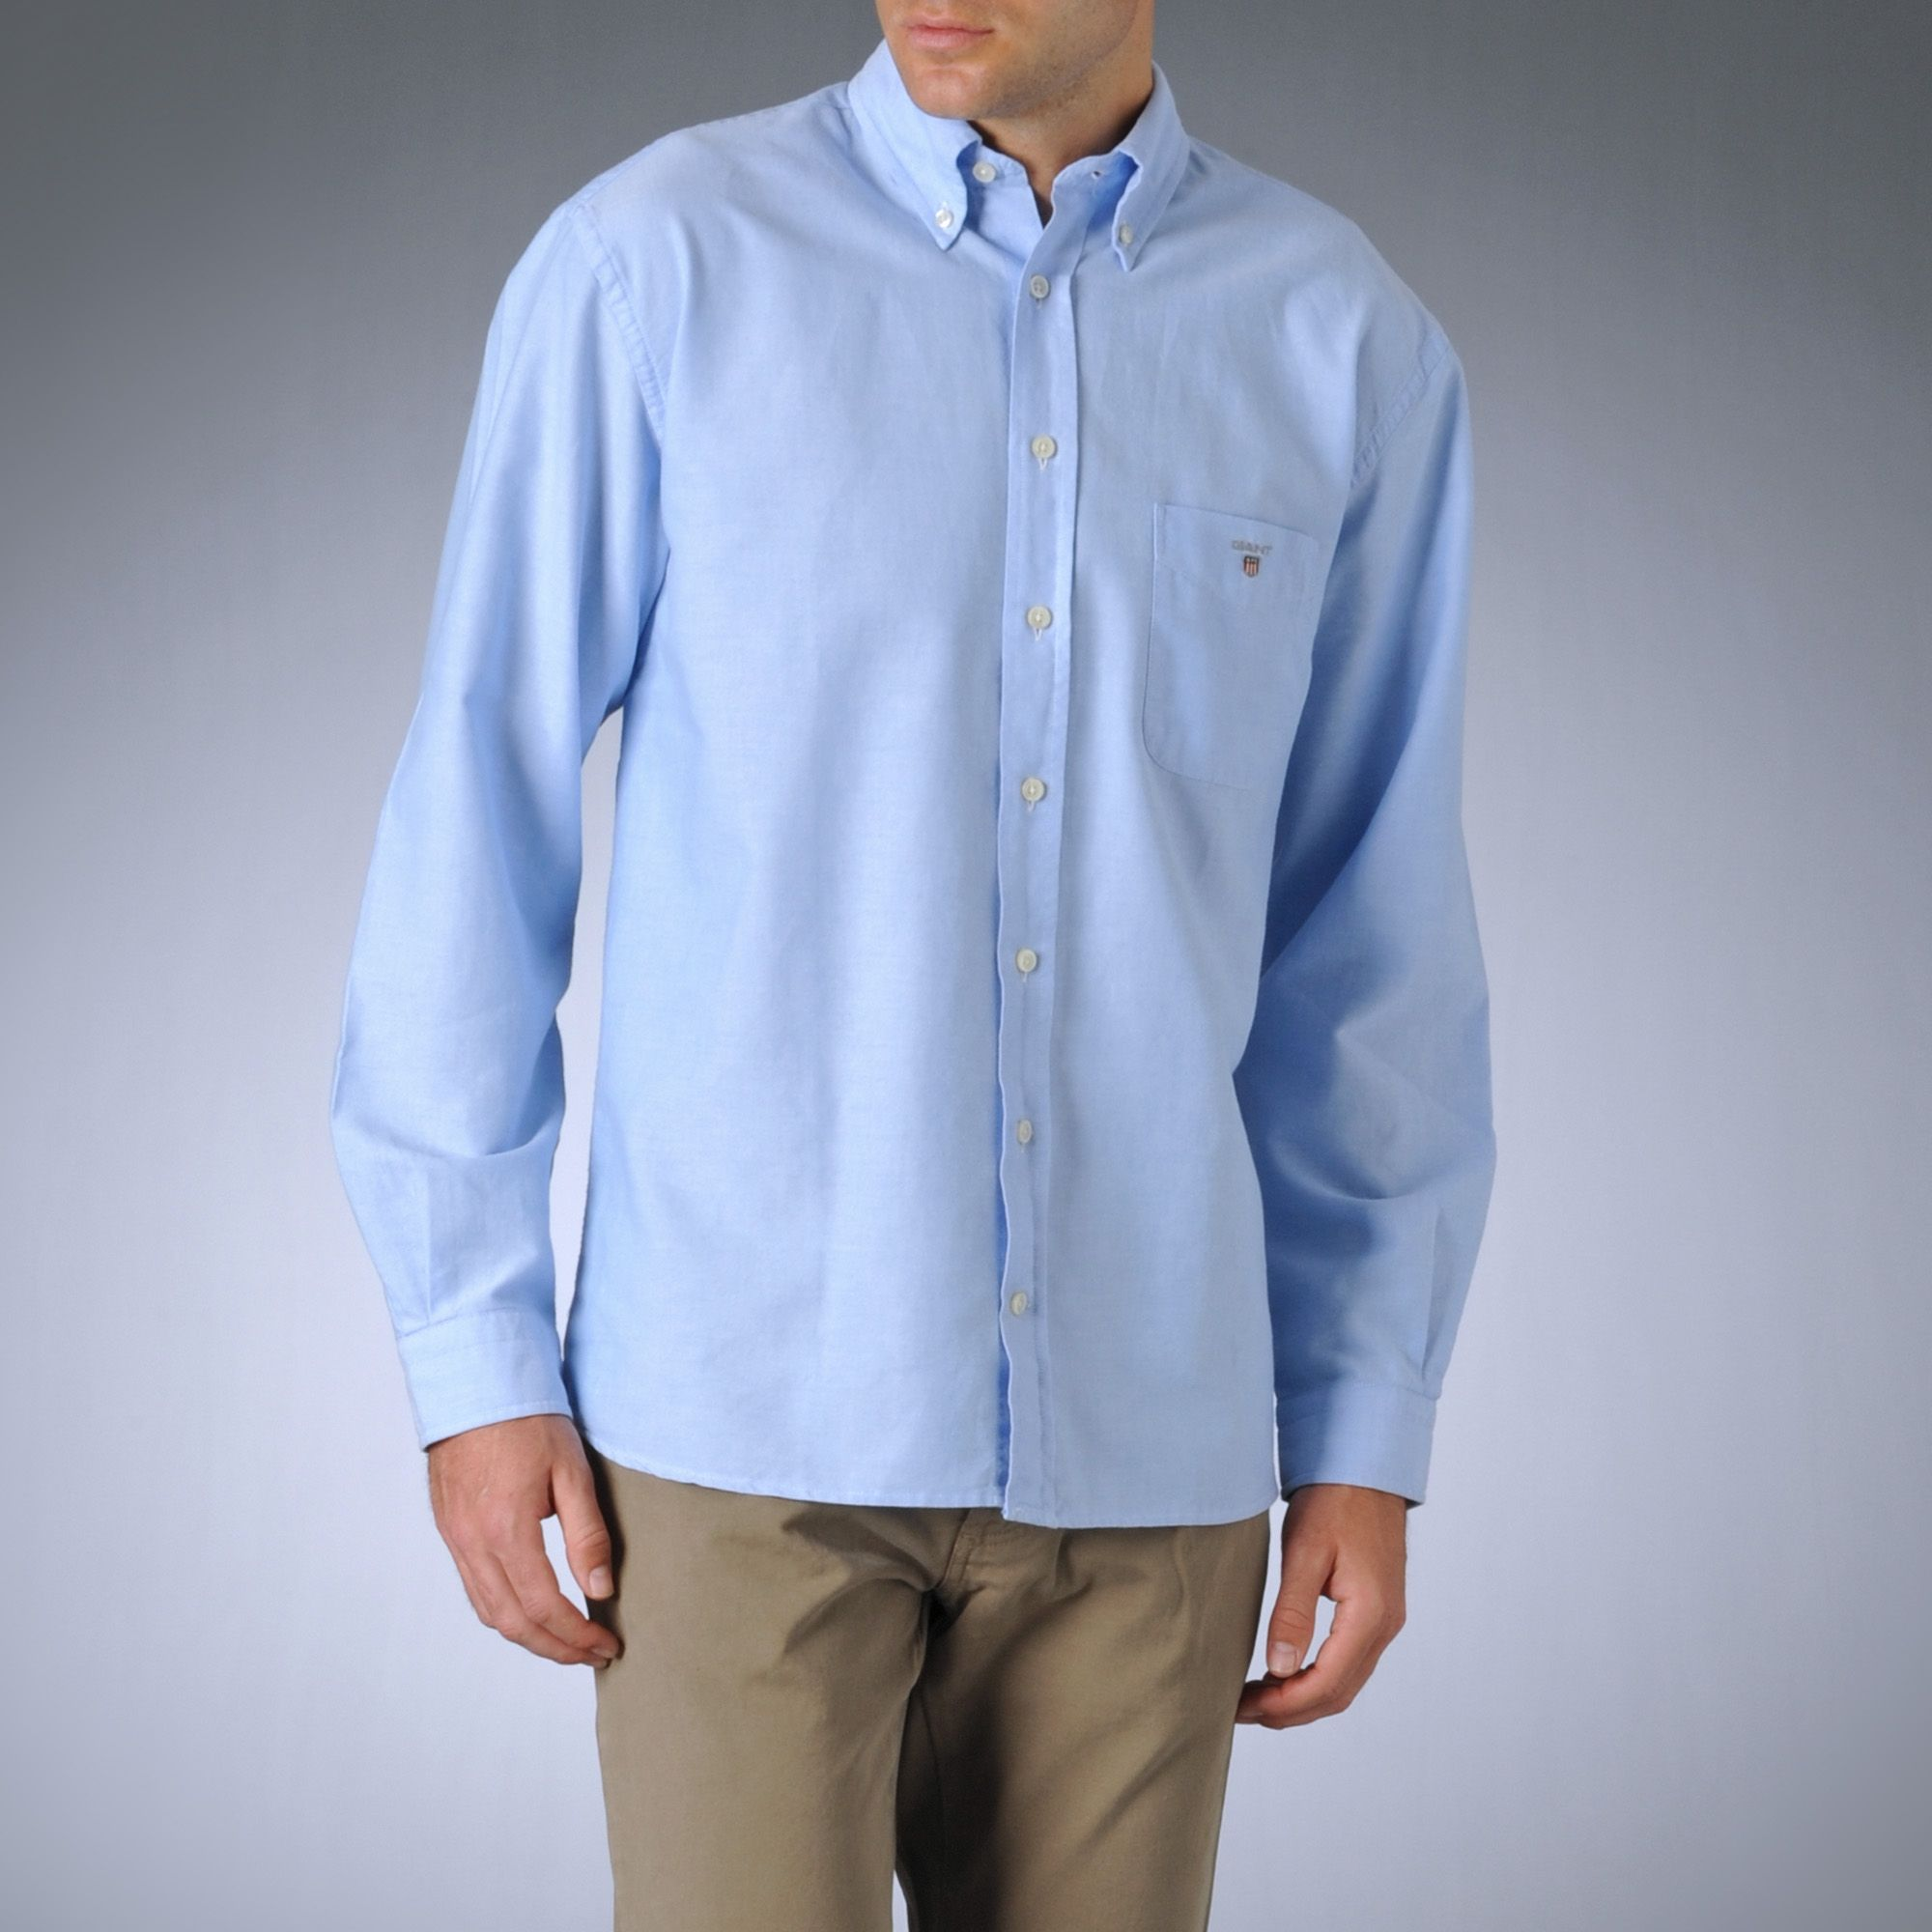 Blue oxford shirt t shirts design concept for Mens blue oxford shirt